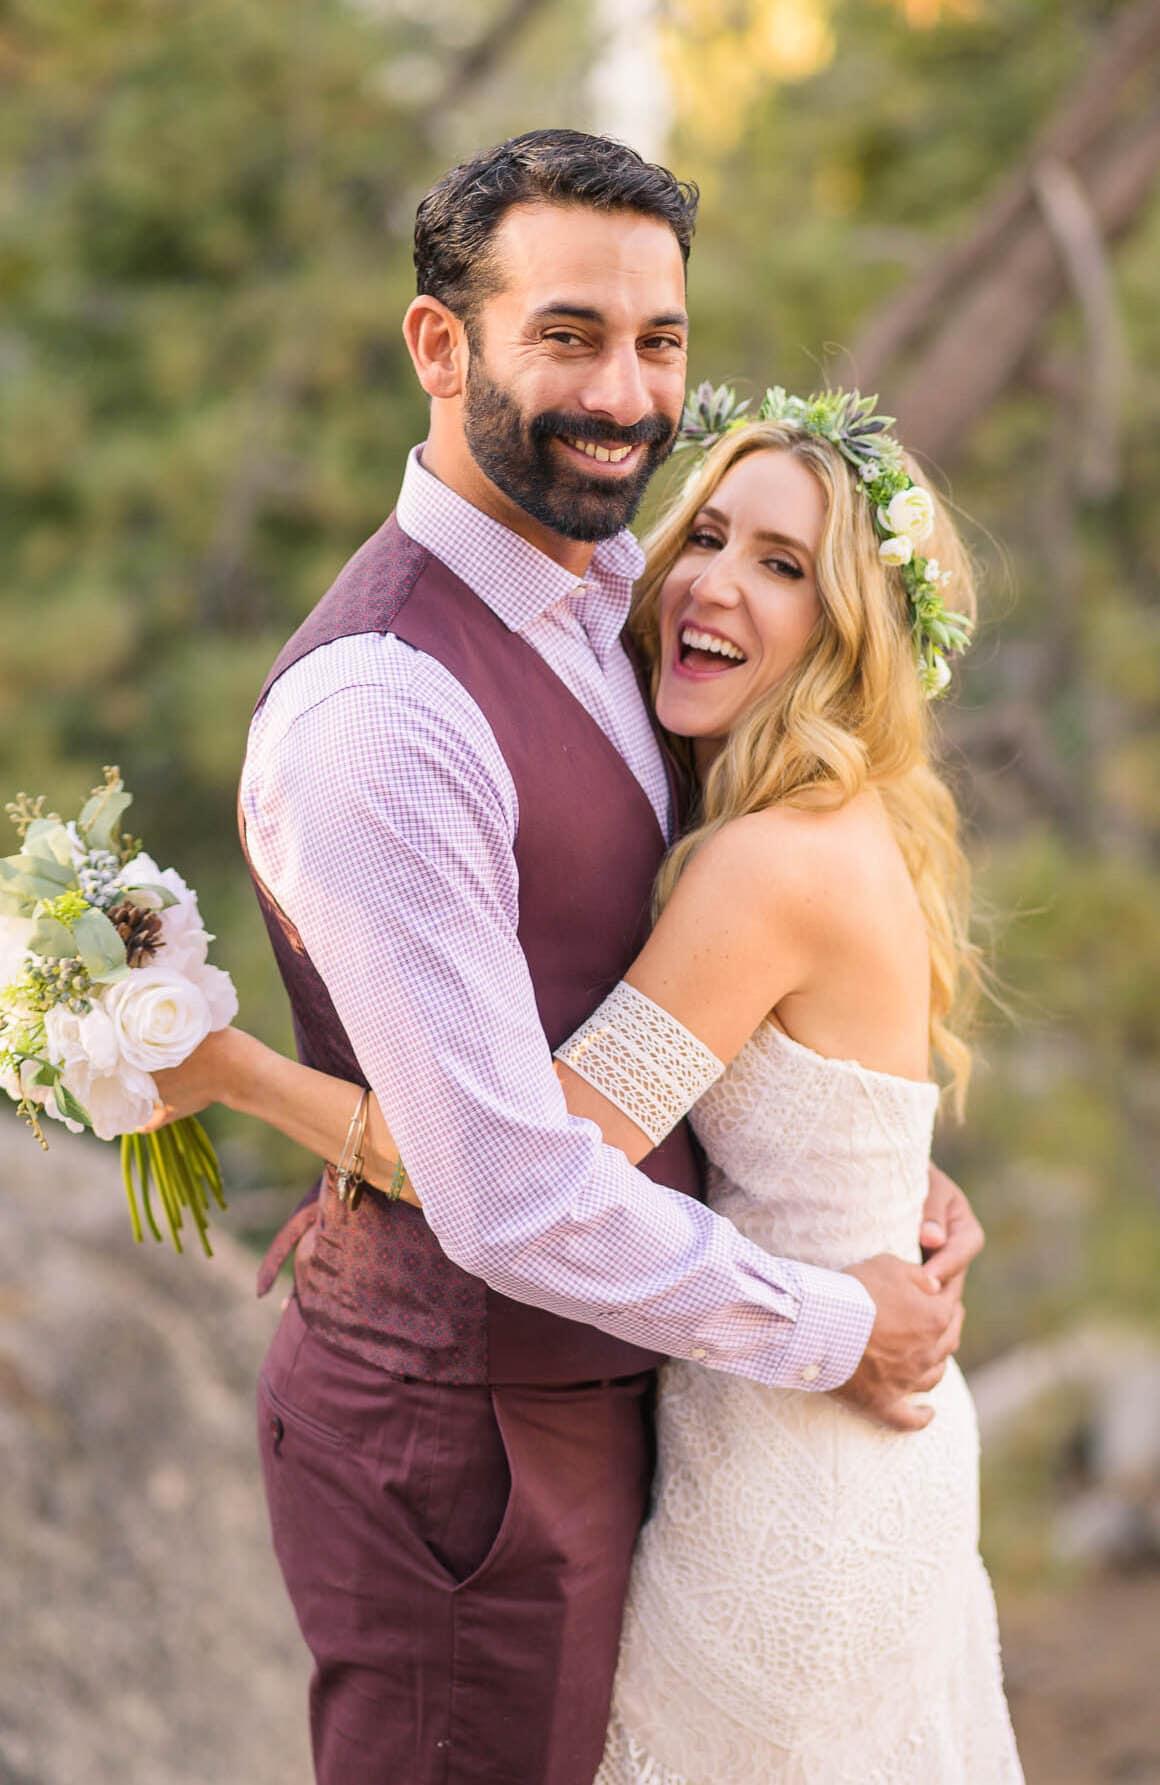 Alan & Heidi Big Bear Elopement Couple